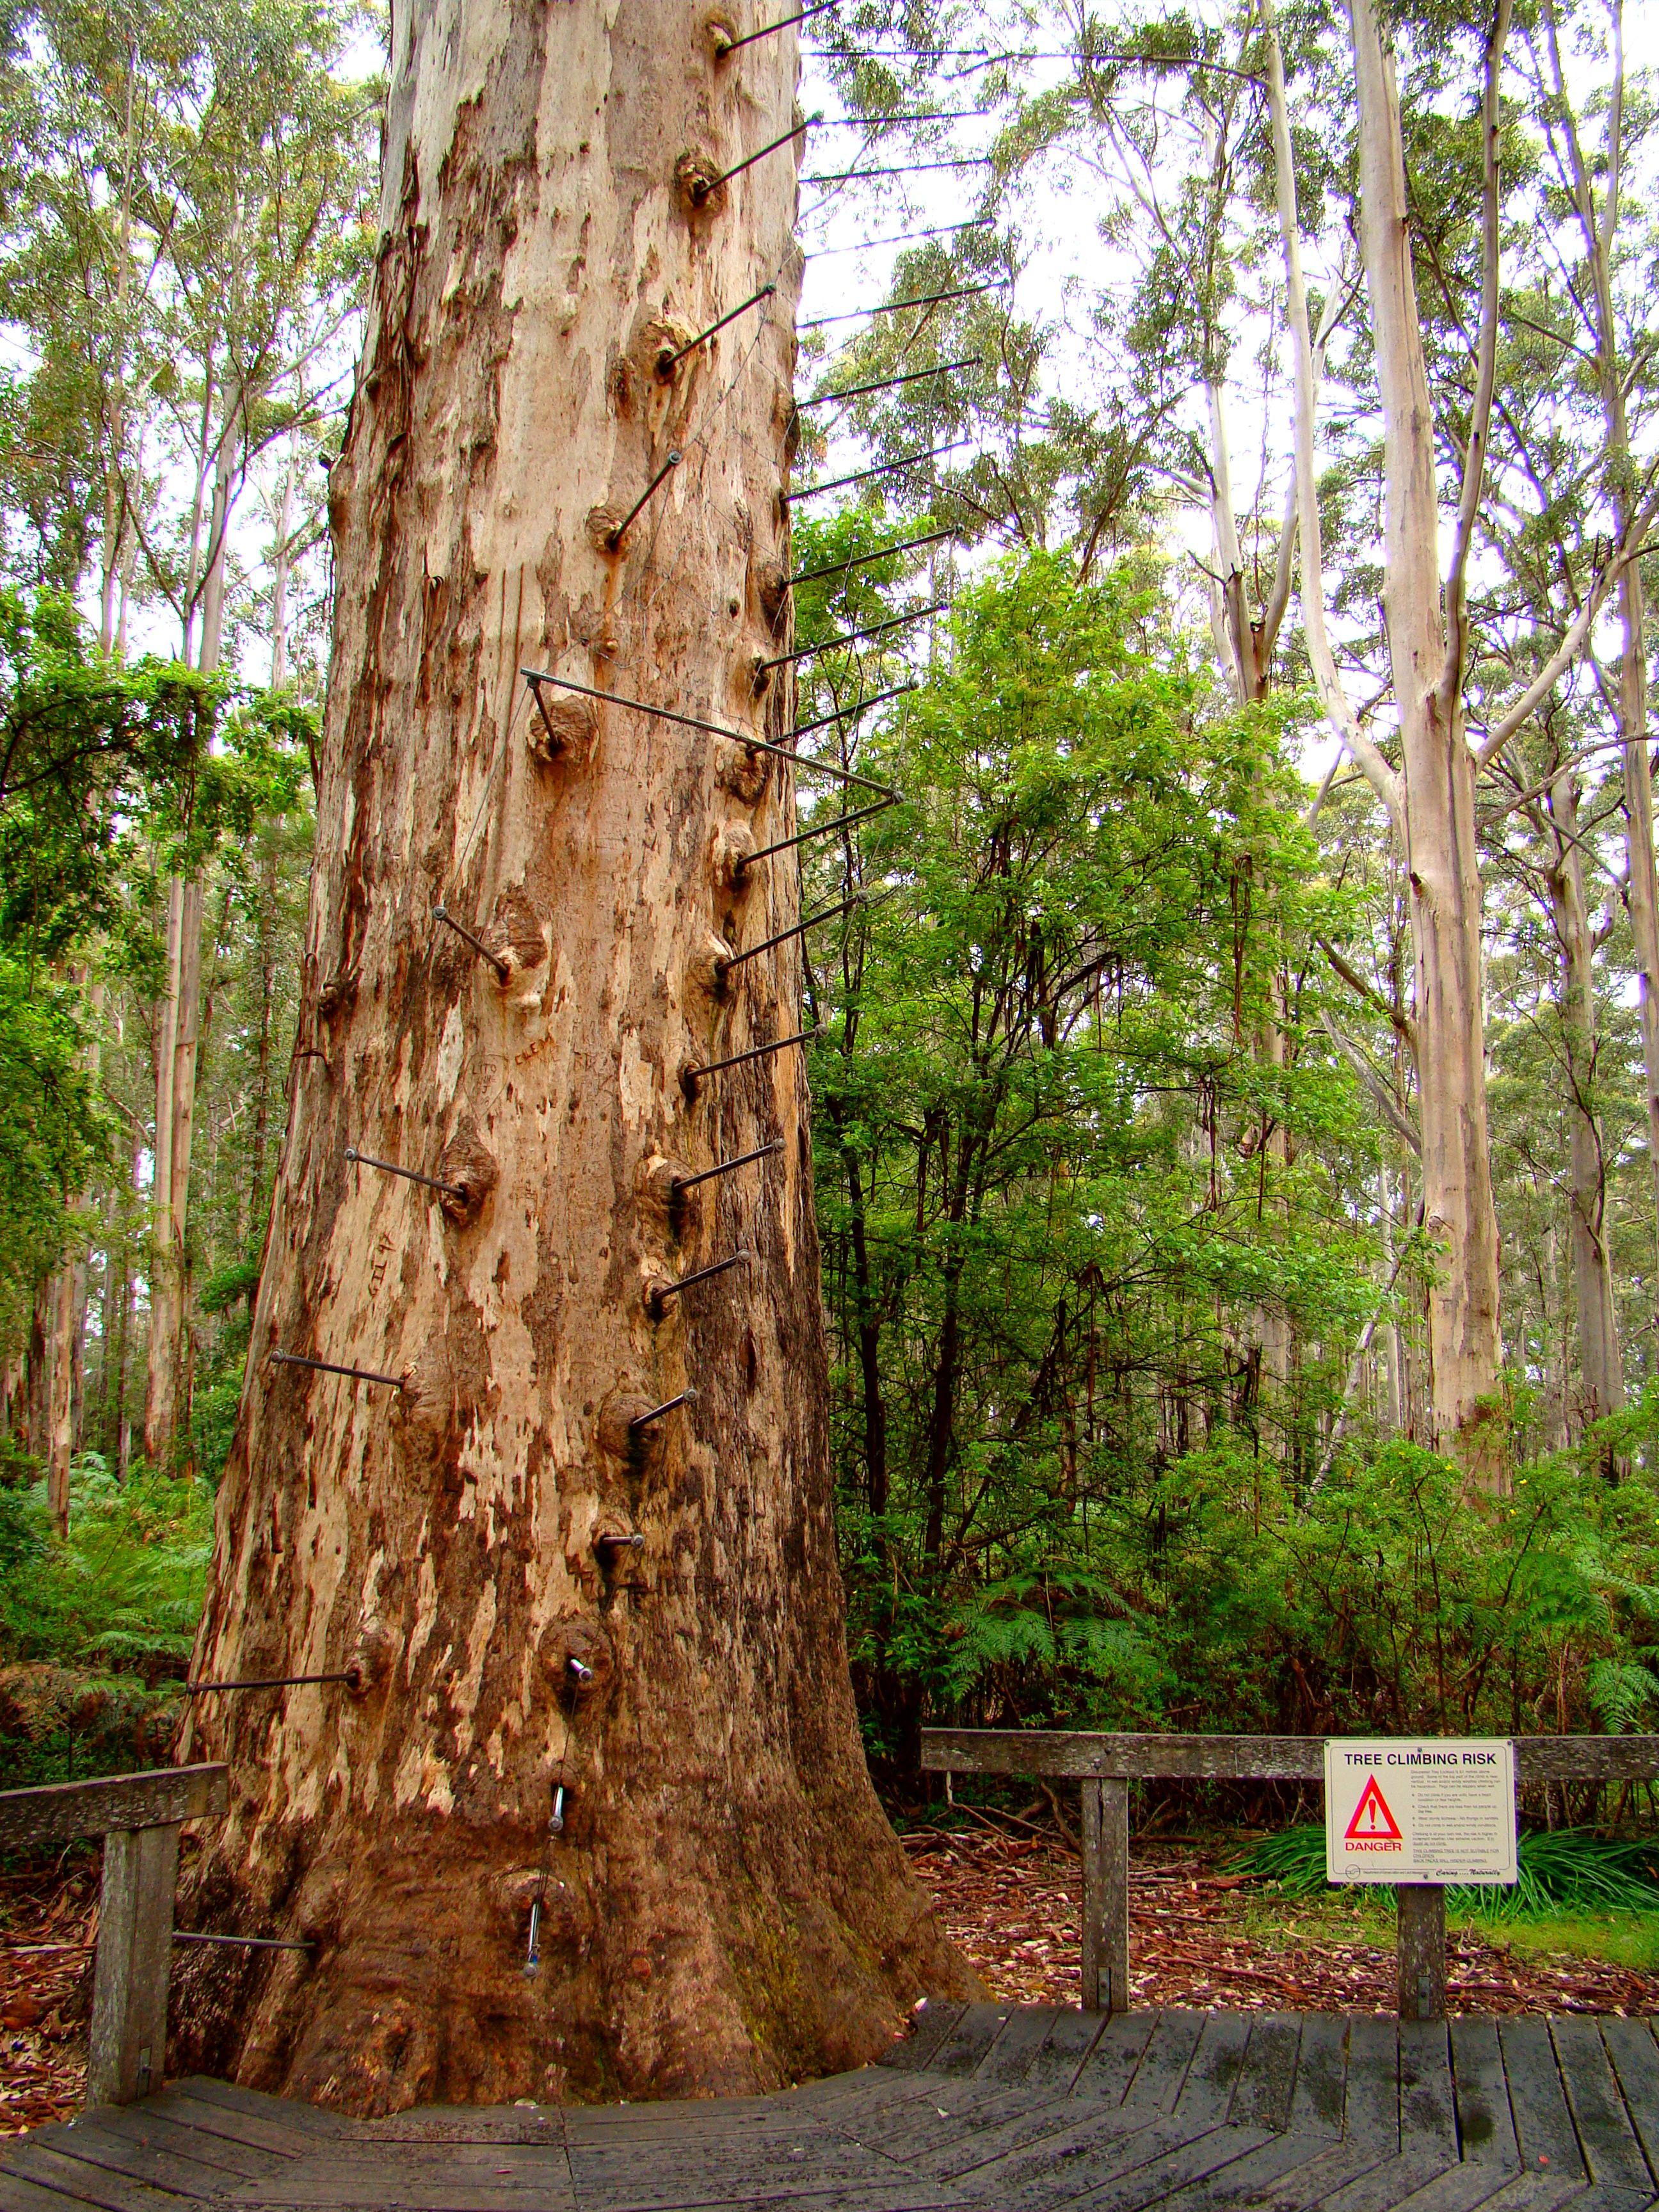 Gloucester Tree - Wikipedia